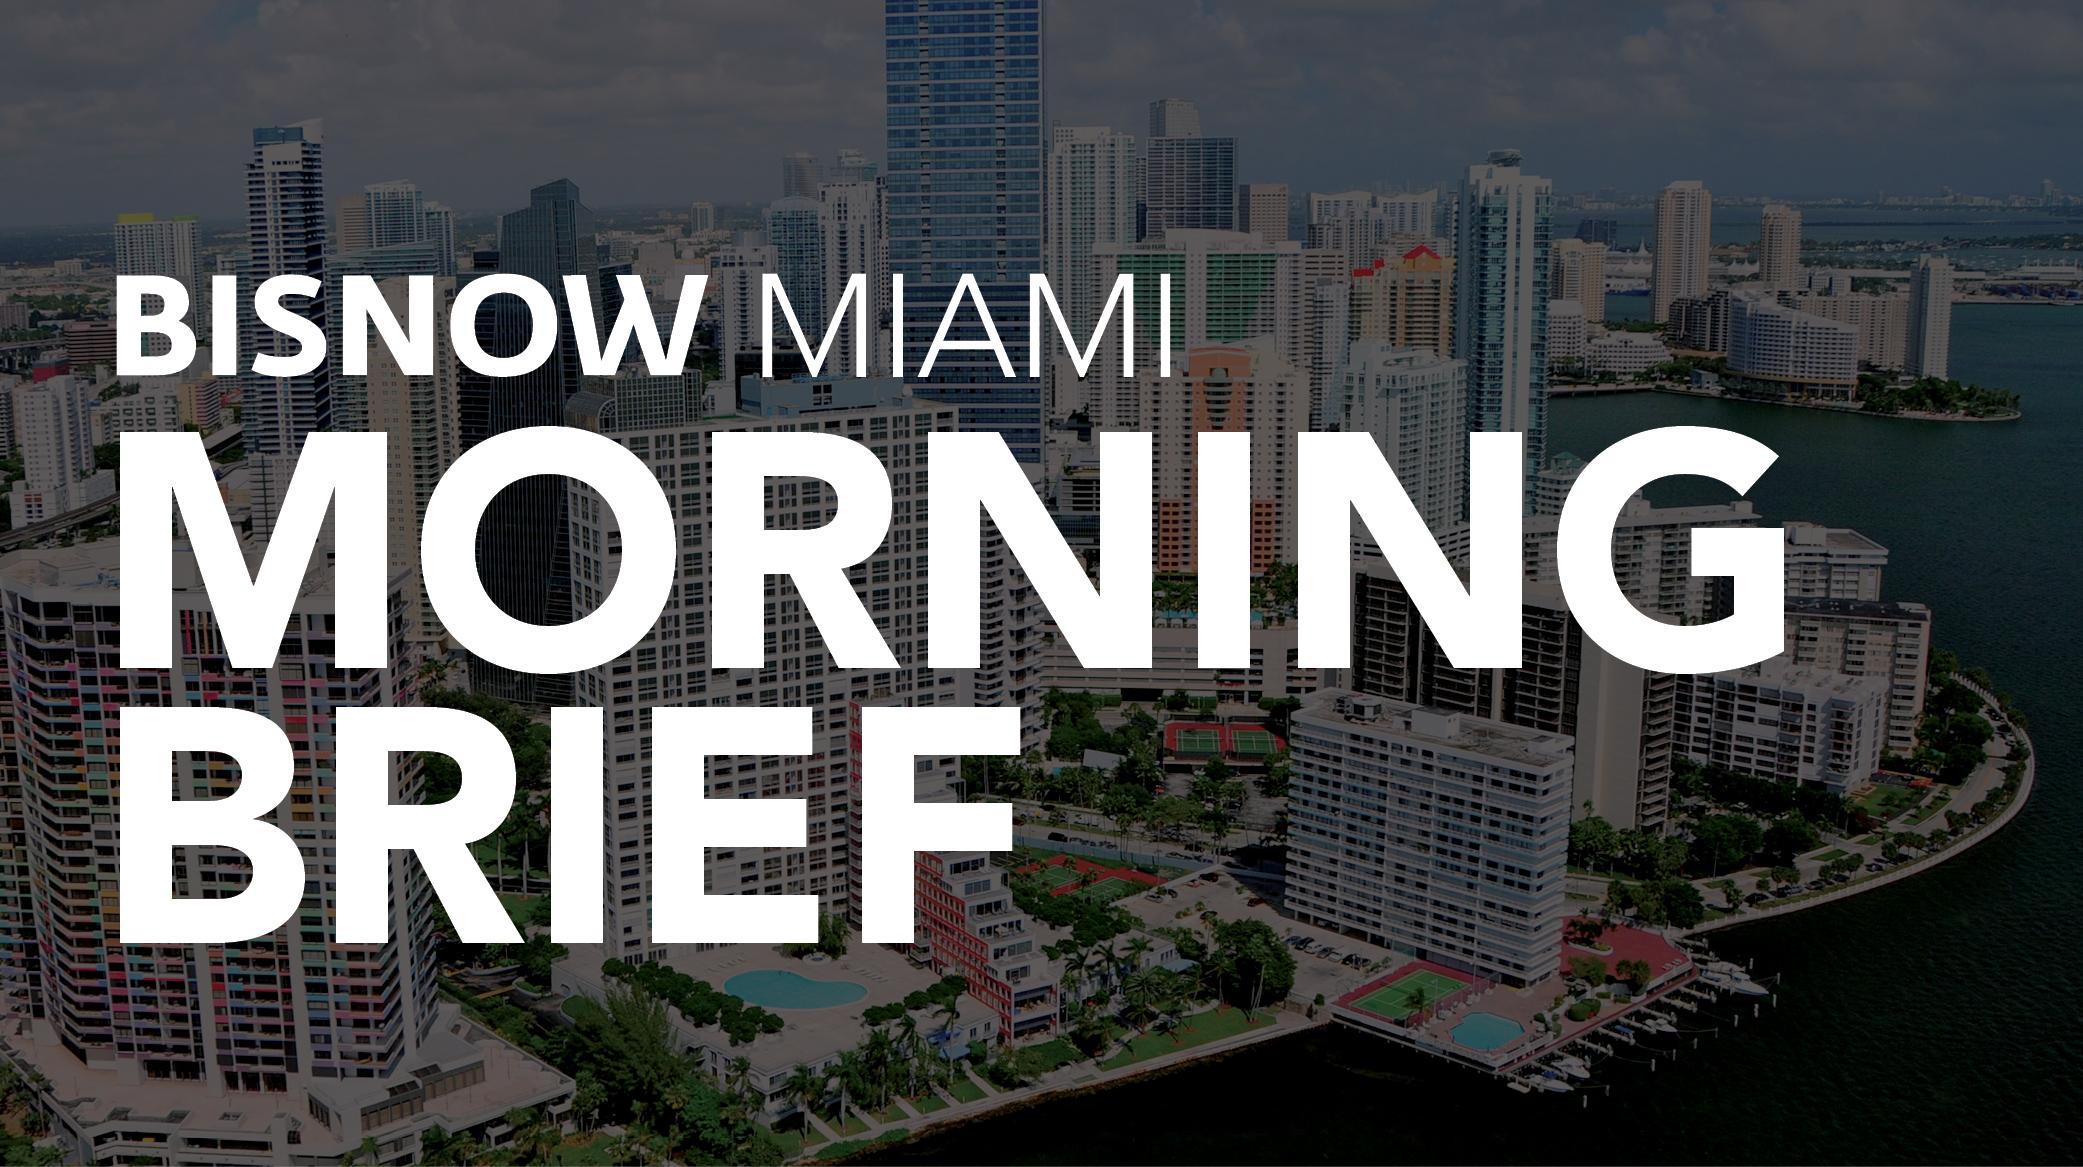 Bisnow Morning Brief South Florida